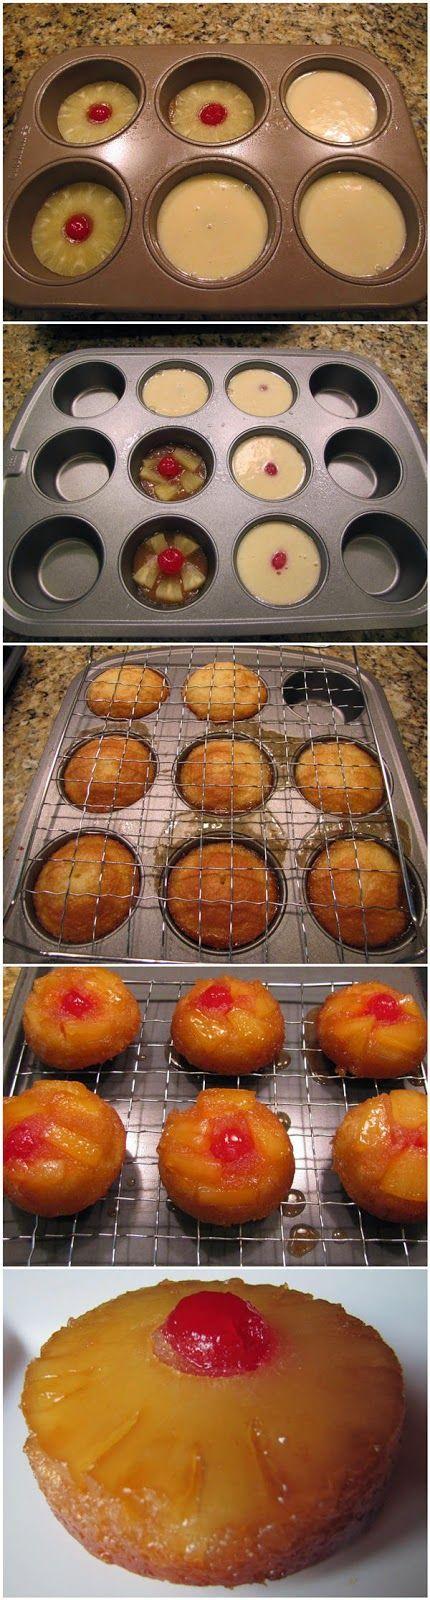 Mini Pineapple Upside Down Cakes - toprecipeblog